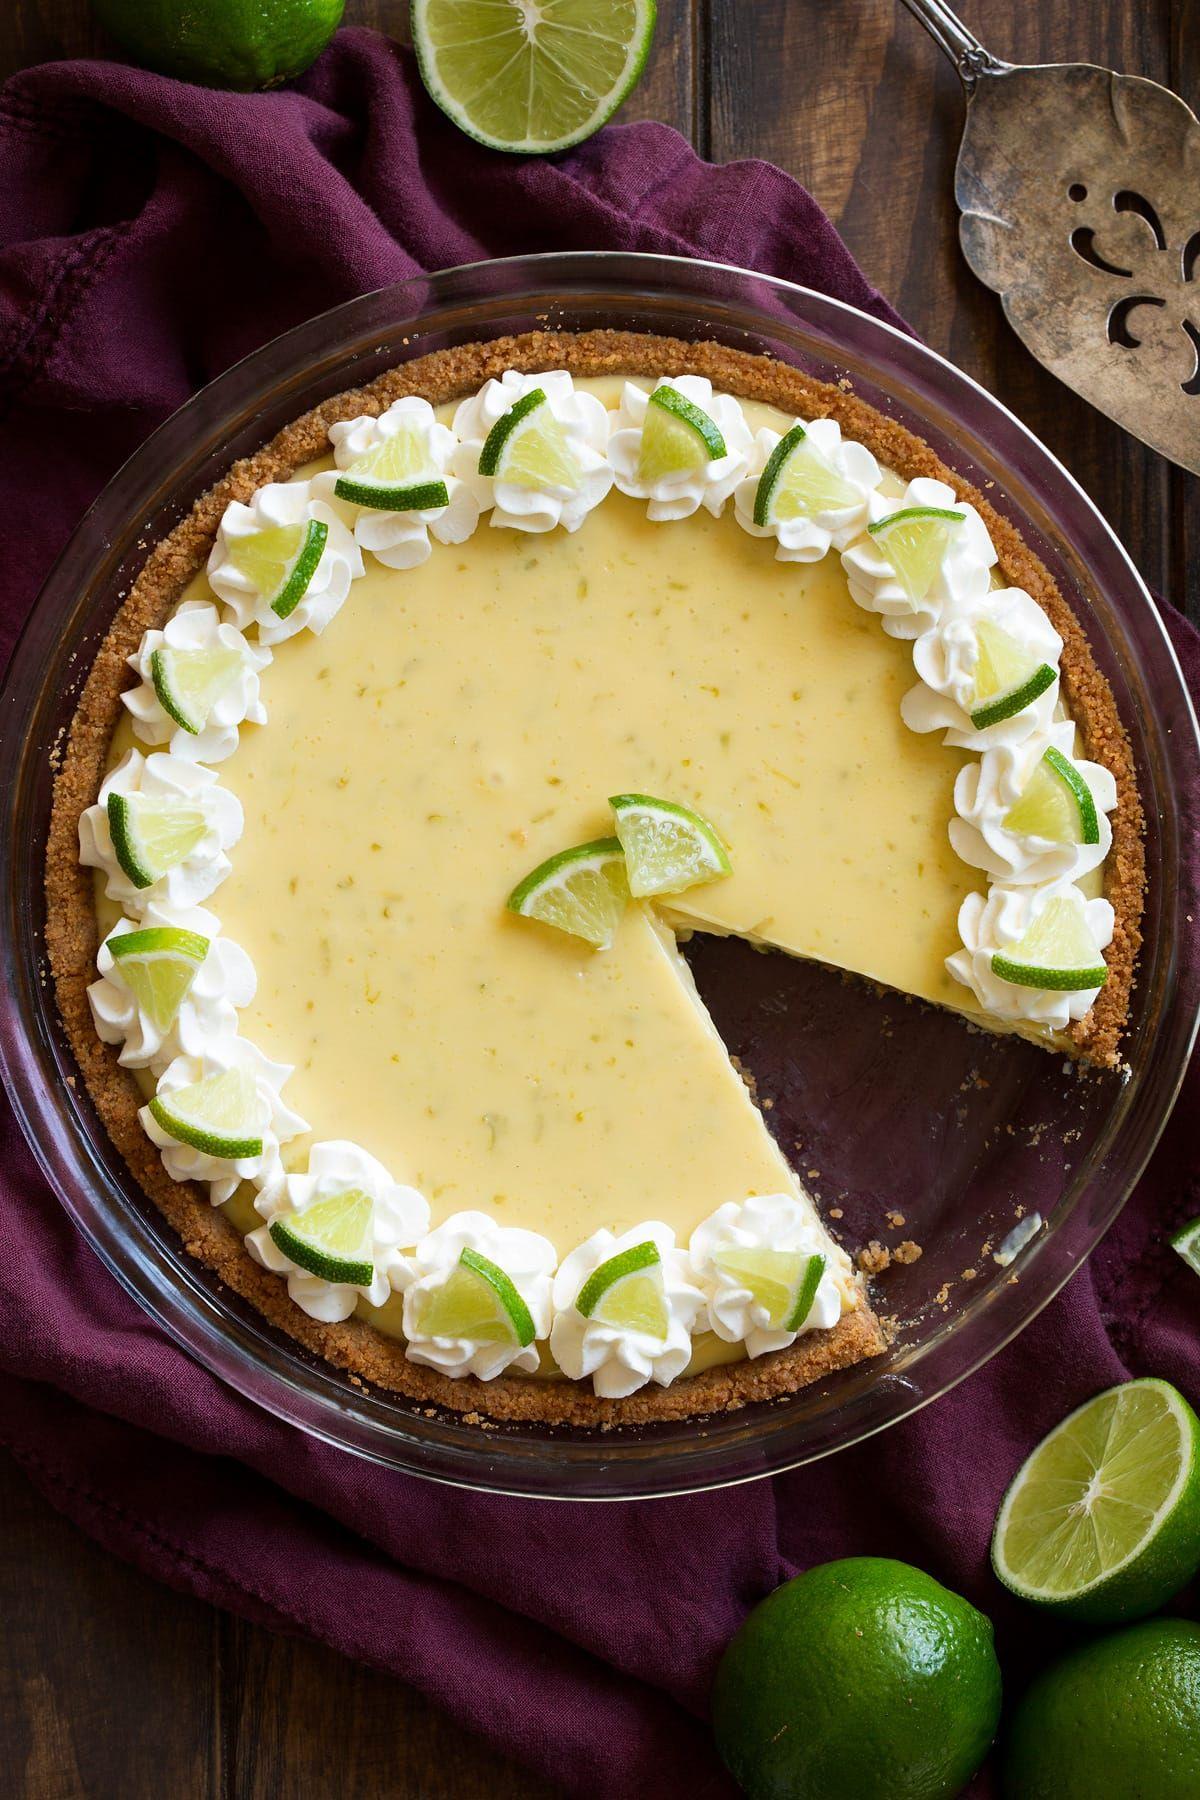 Key Lime Pie Decoration.Best Key Lime Pie Recipe Sweets In 2019 Lime Pie Recipe